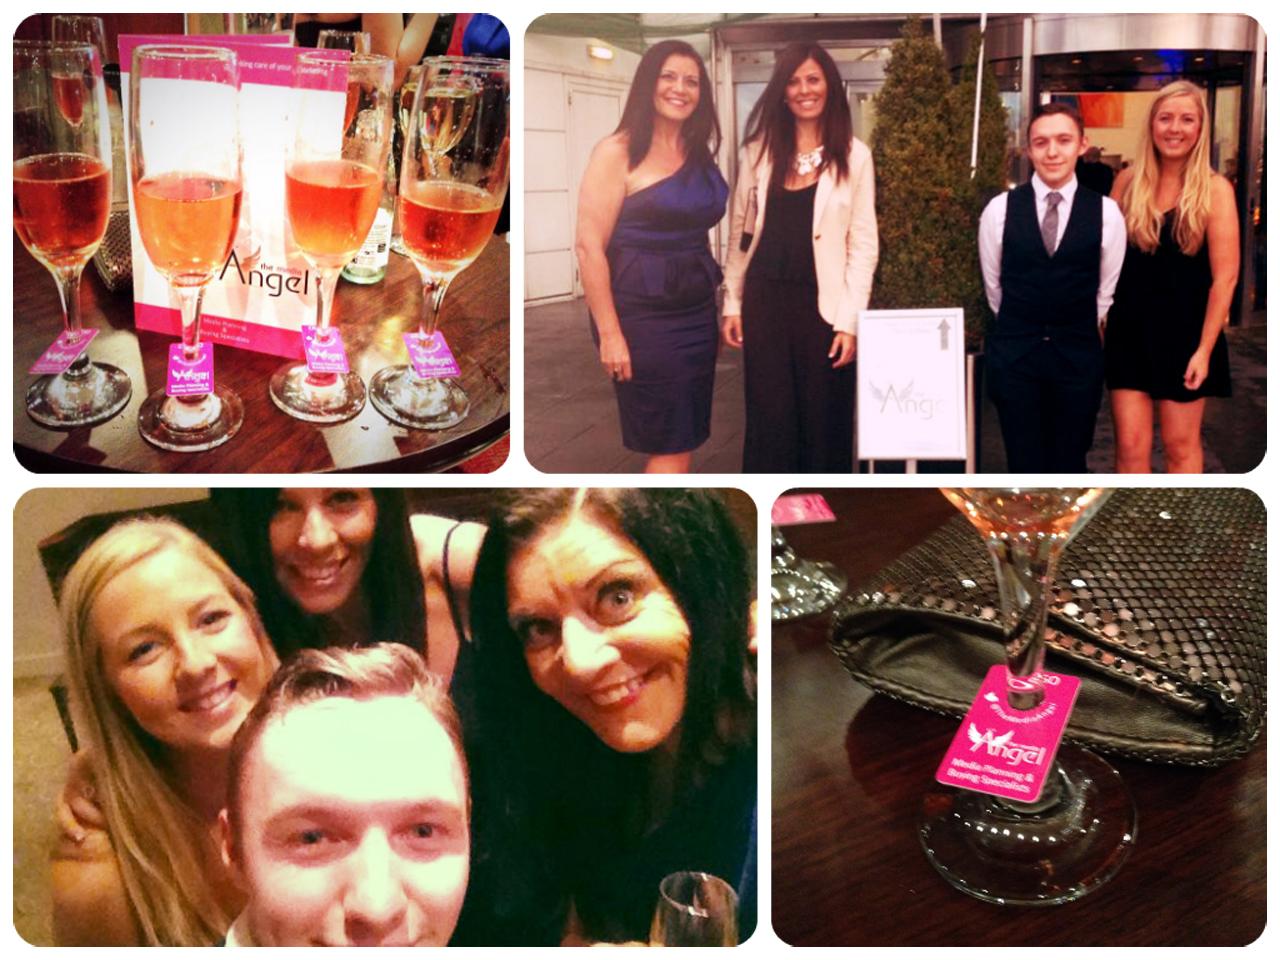 CIM Wales Canmol Marketing Awards 2014 - The Media Angel